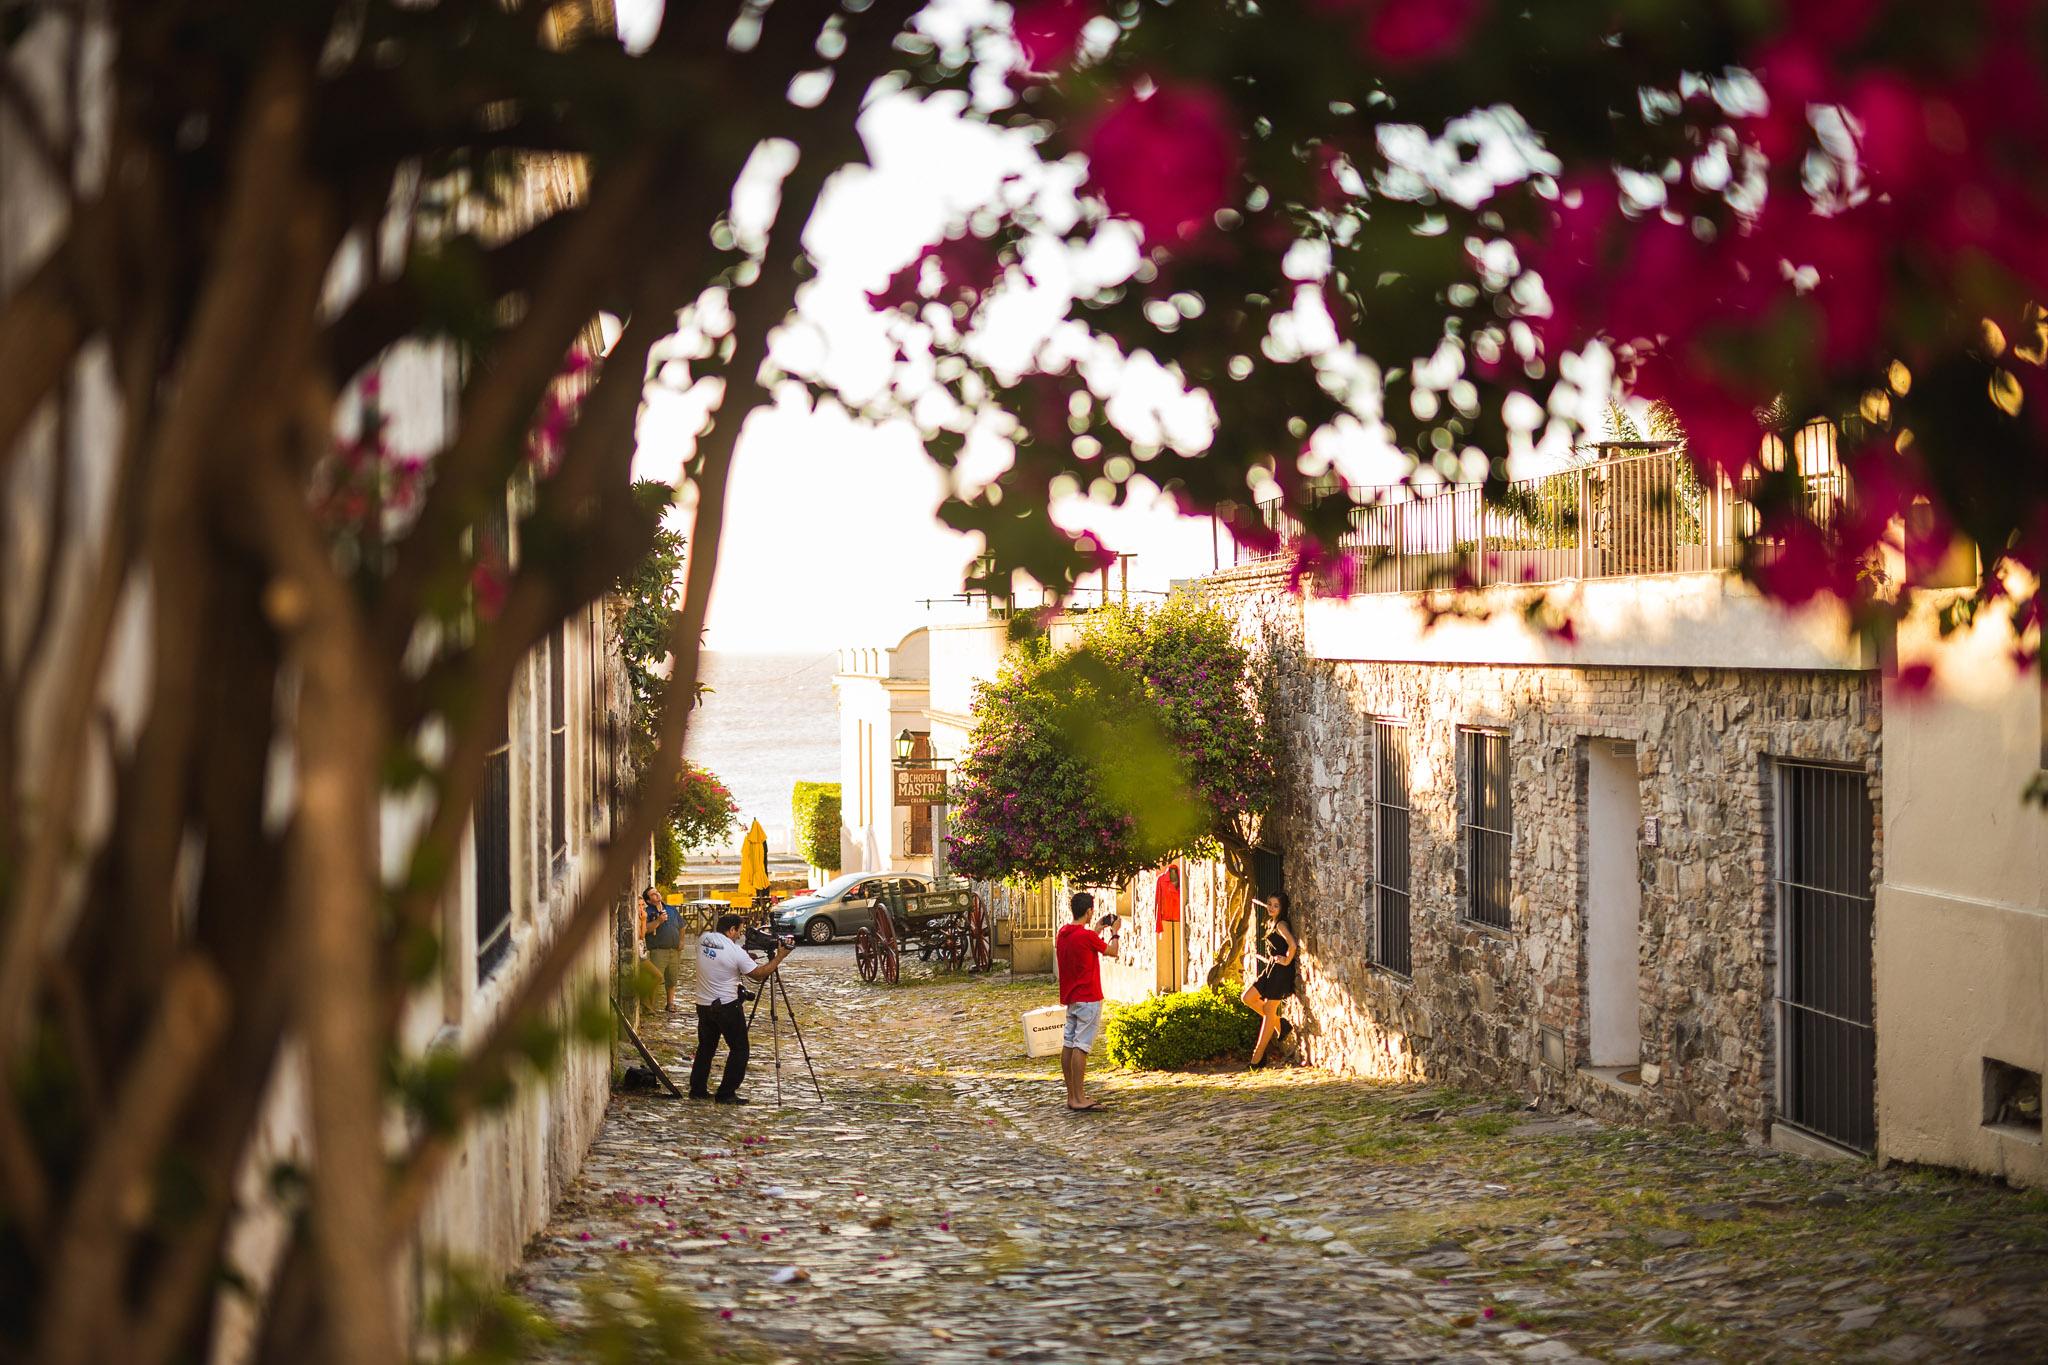 wedding-travellers-destination-photography-overlanding-south-america-uruguay-colonia-del-sacramento-photoshooting-quinzenera